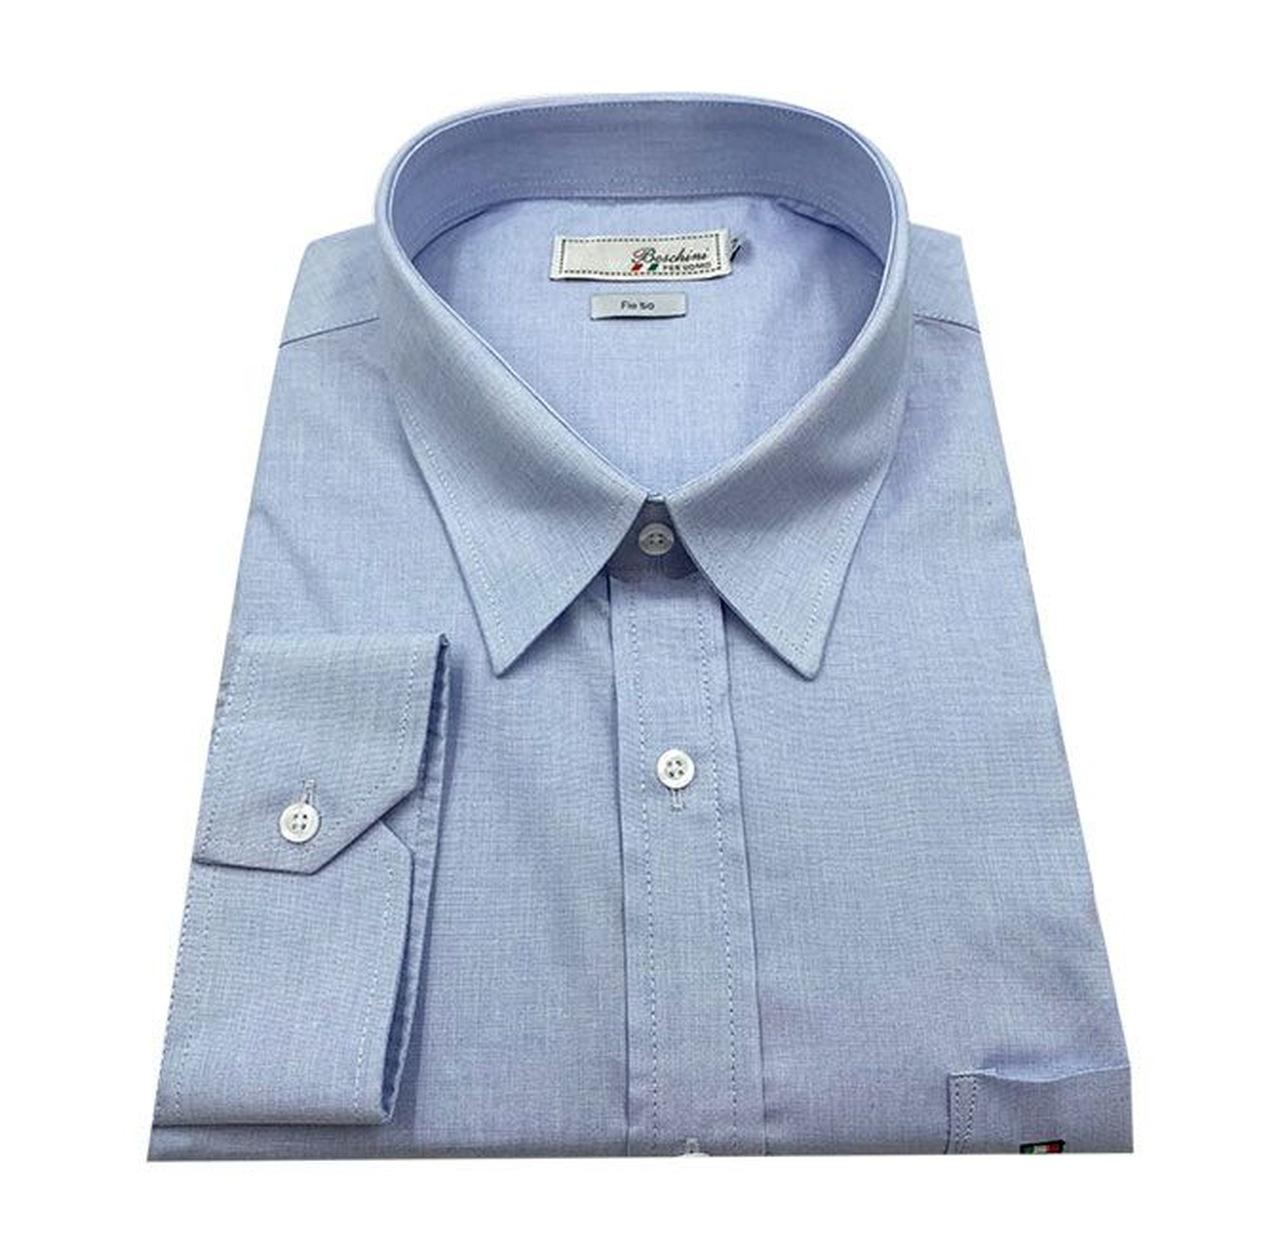 Camisa Social Manga Longa Masculina Plus Size Azul Claro